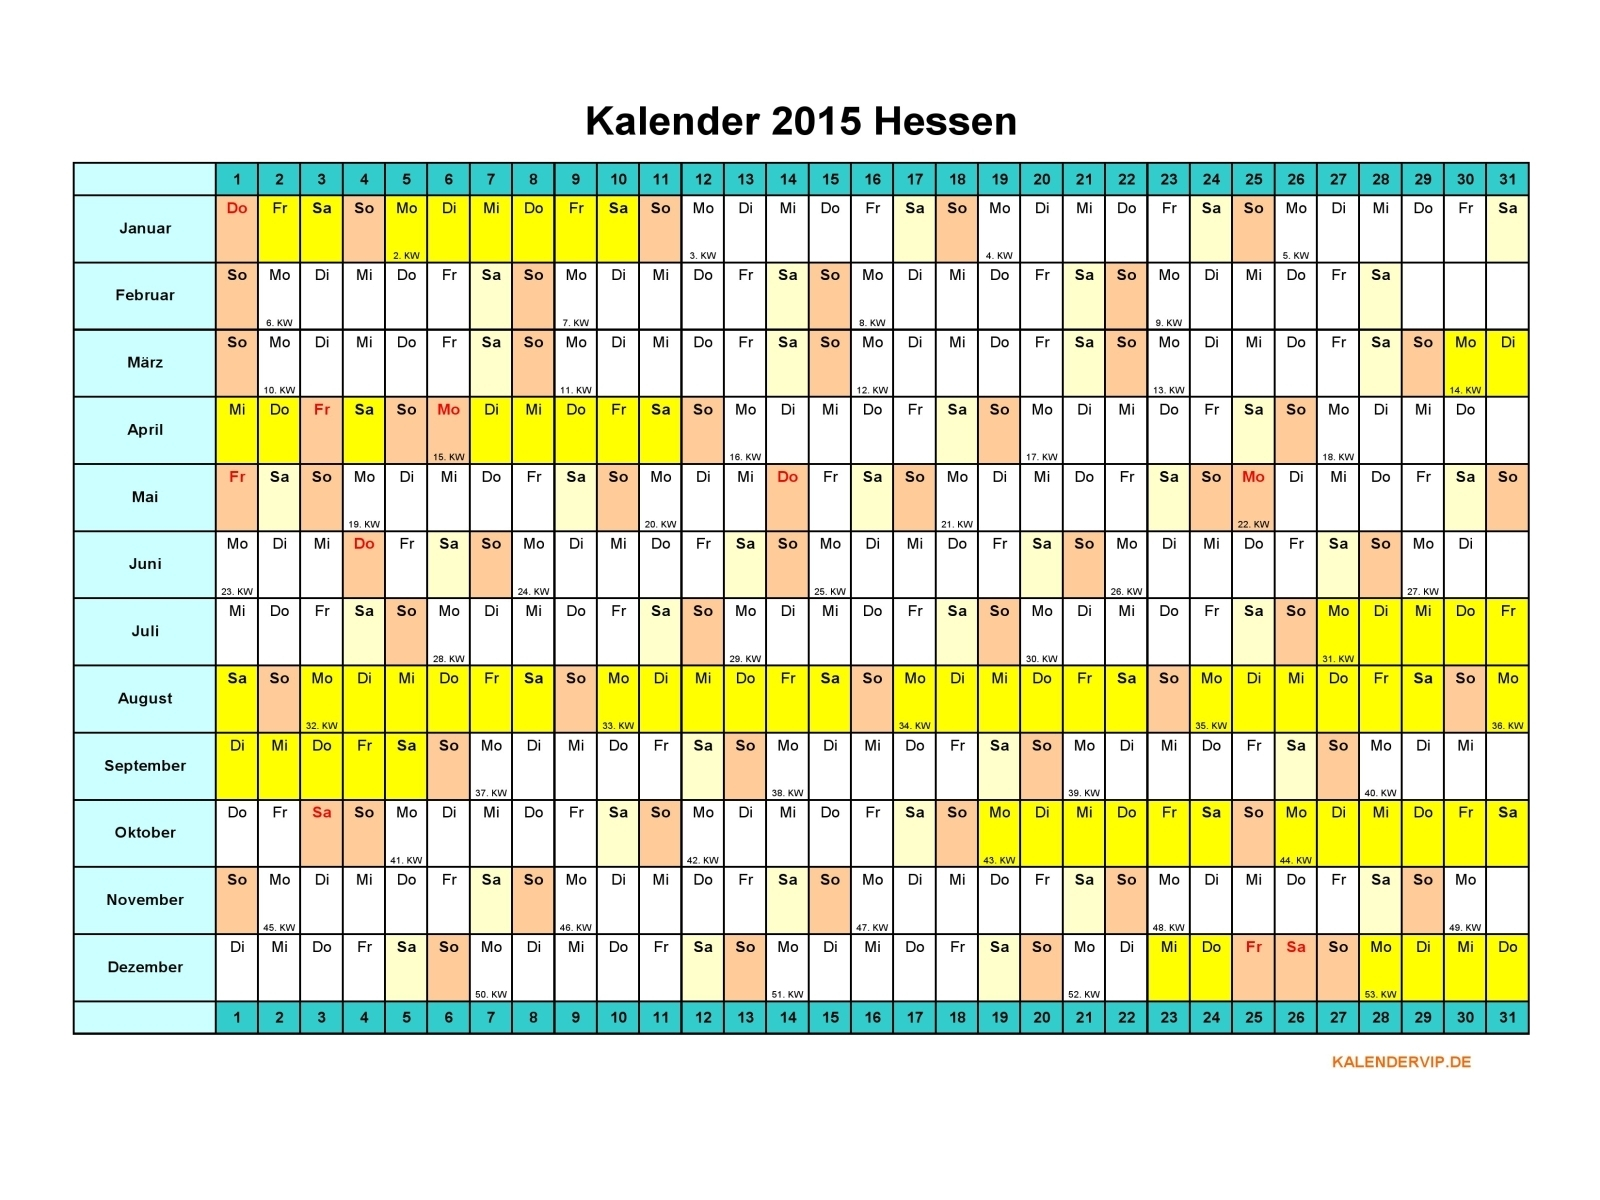 Kalender 2015 Hessen - KalenderVIP